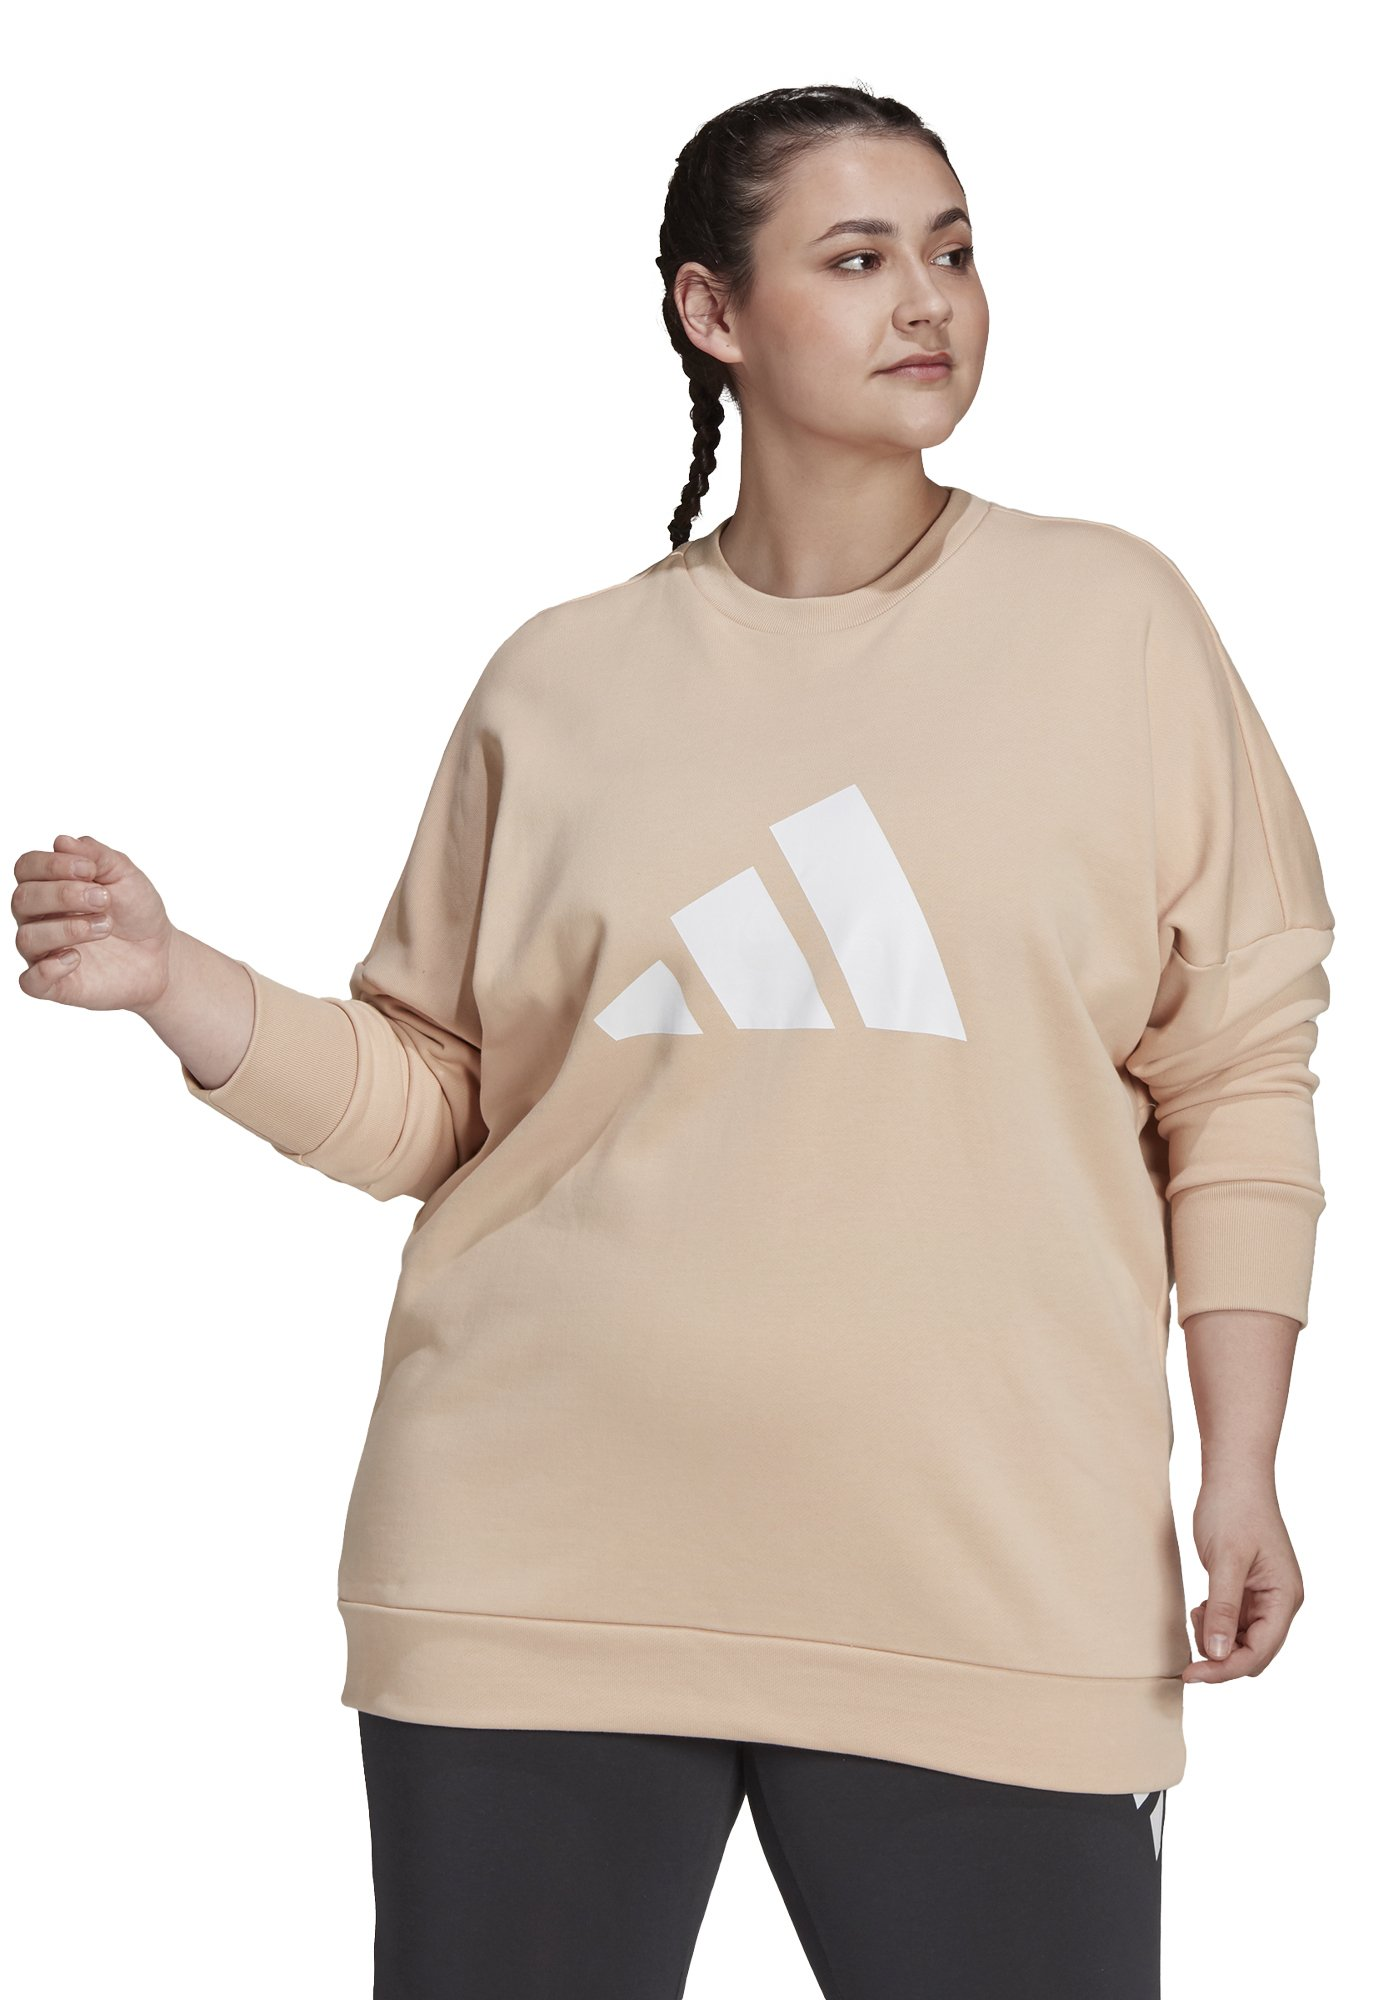 Women FI 3B CREW SPORTS PRIMEGREEN PULLOVER SWEATSHIRT LOOSE - Sweatshirt